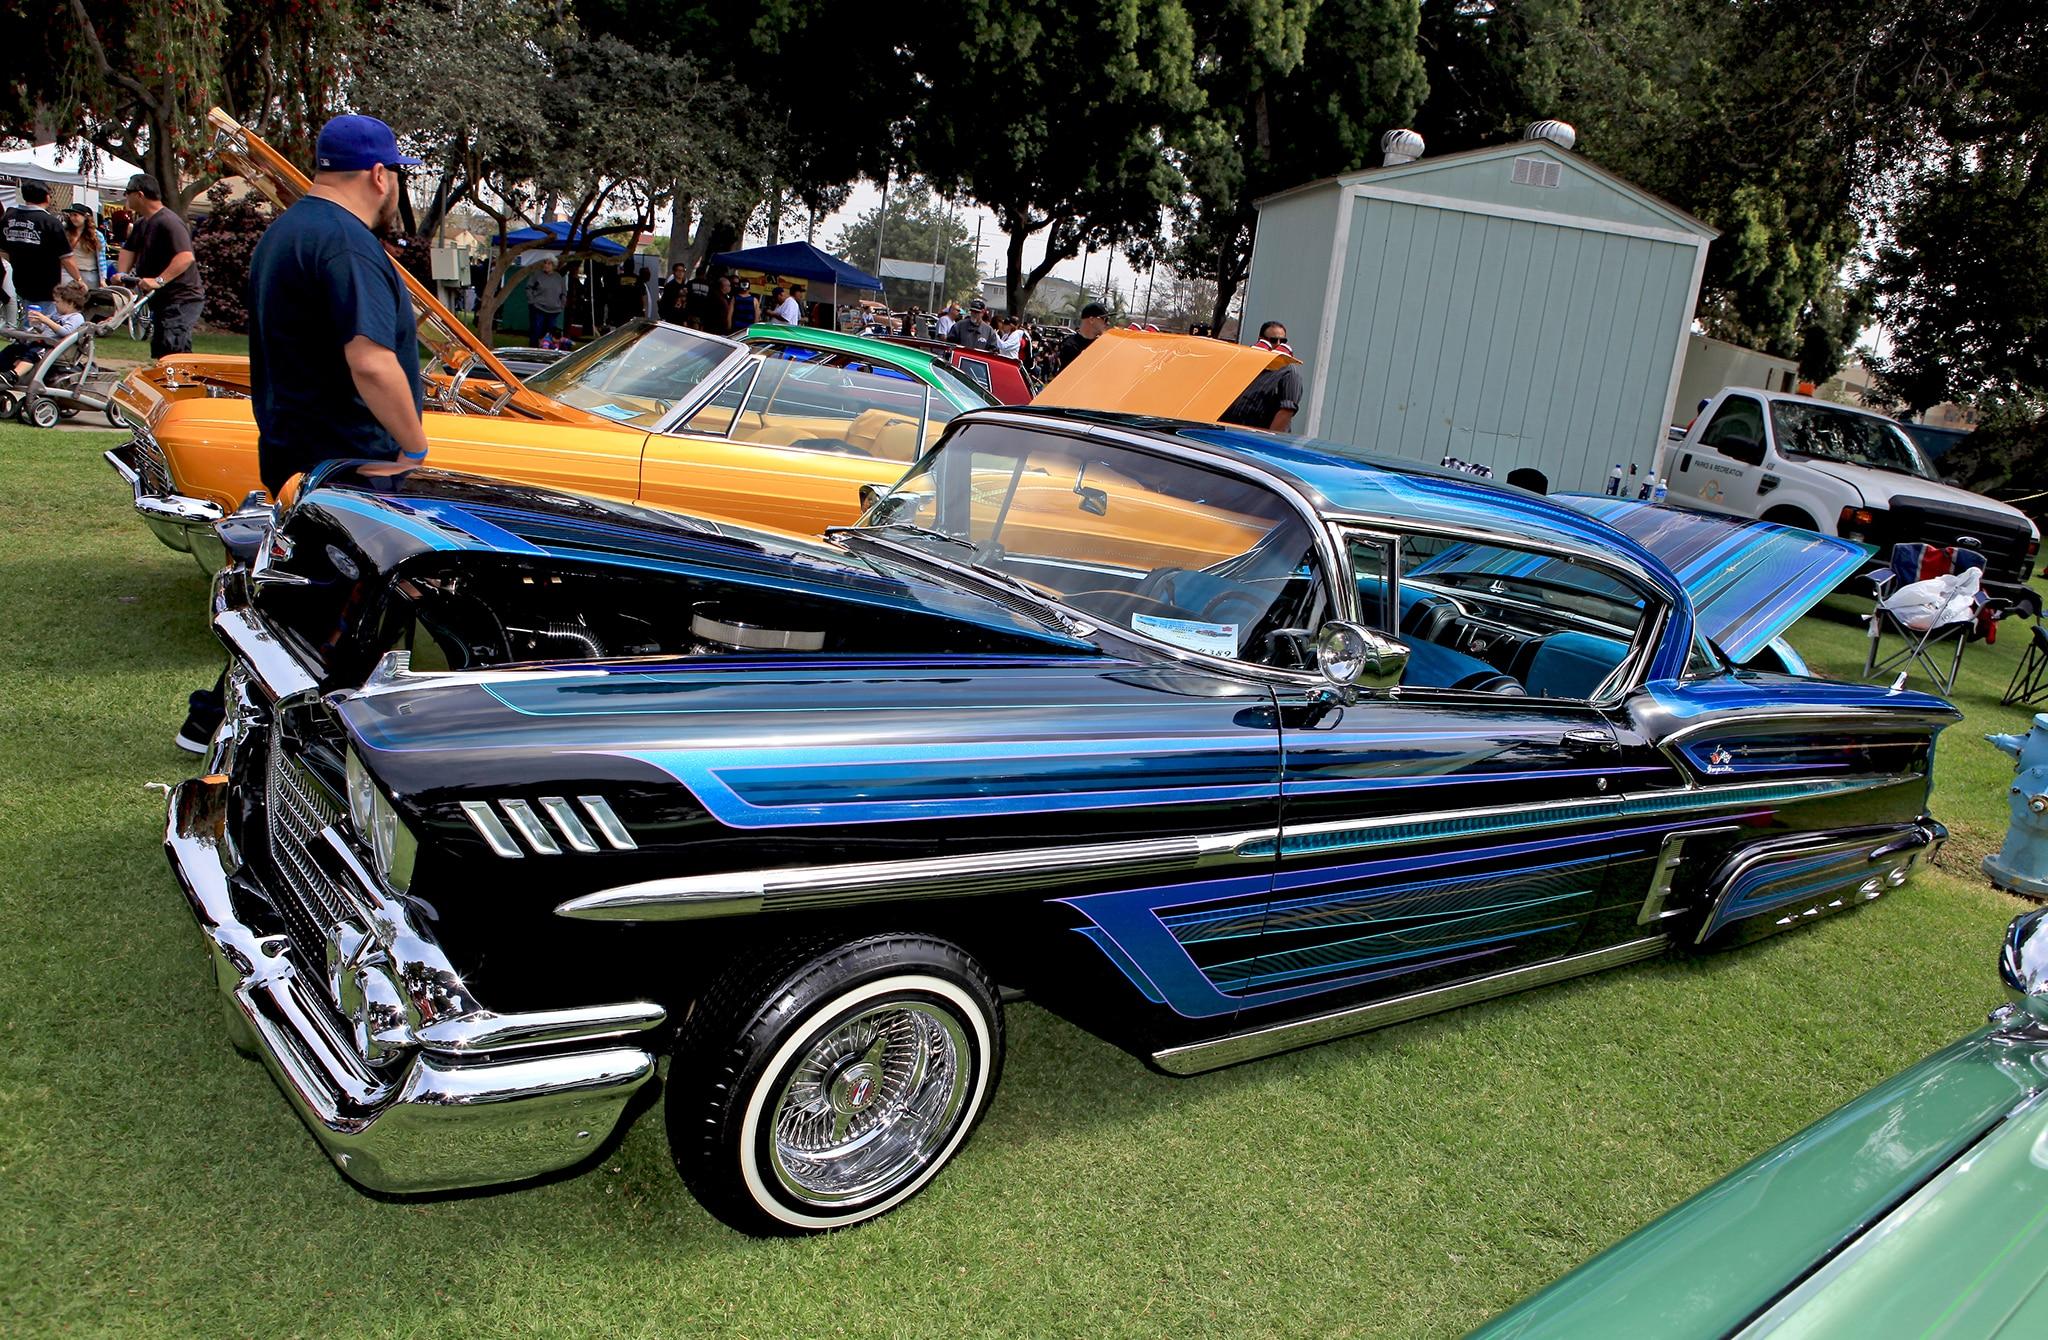 azalea classic car show cadillac lowrider 02 Lowrider